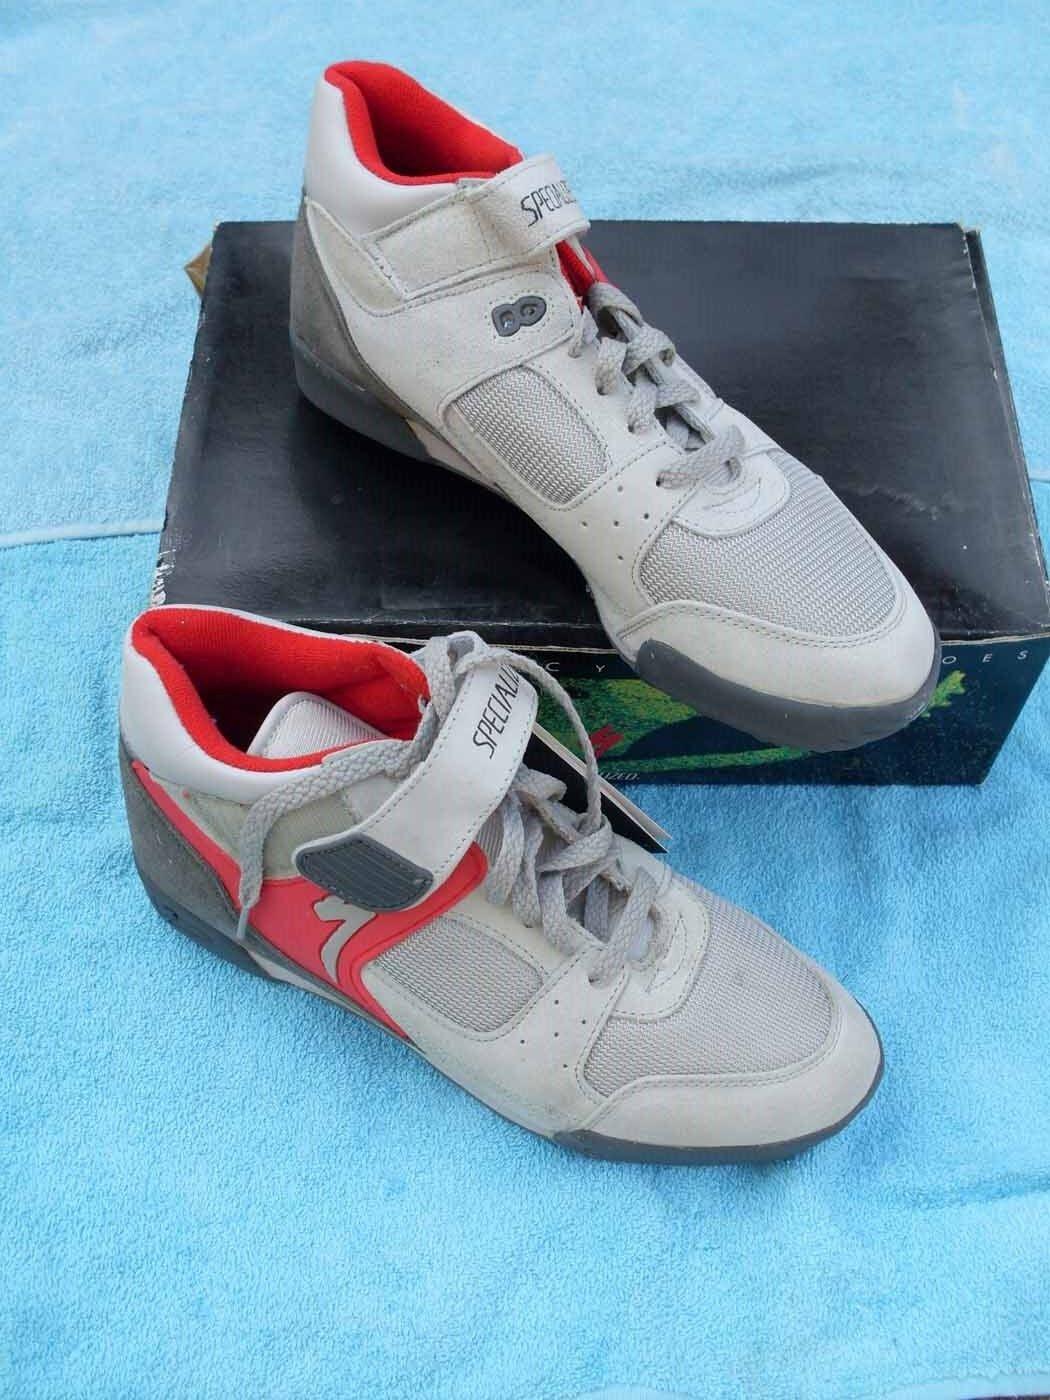 New Cycling scarpe Specialized Dimensione US 10 dirty dog grigio rosso